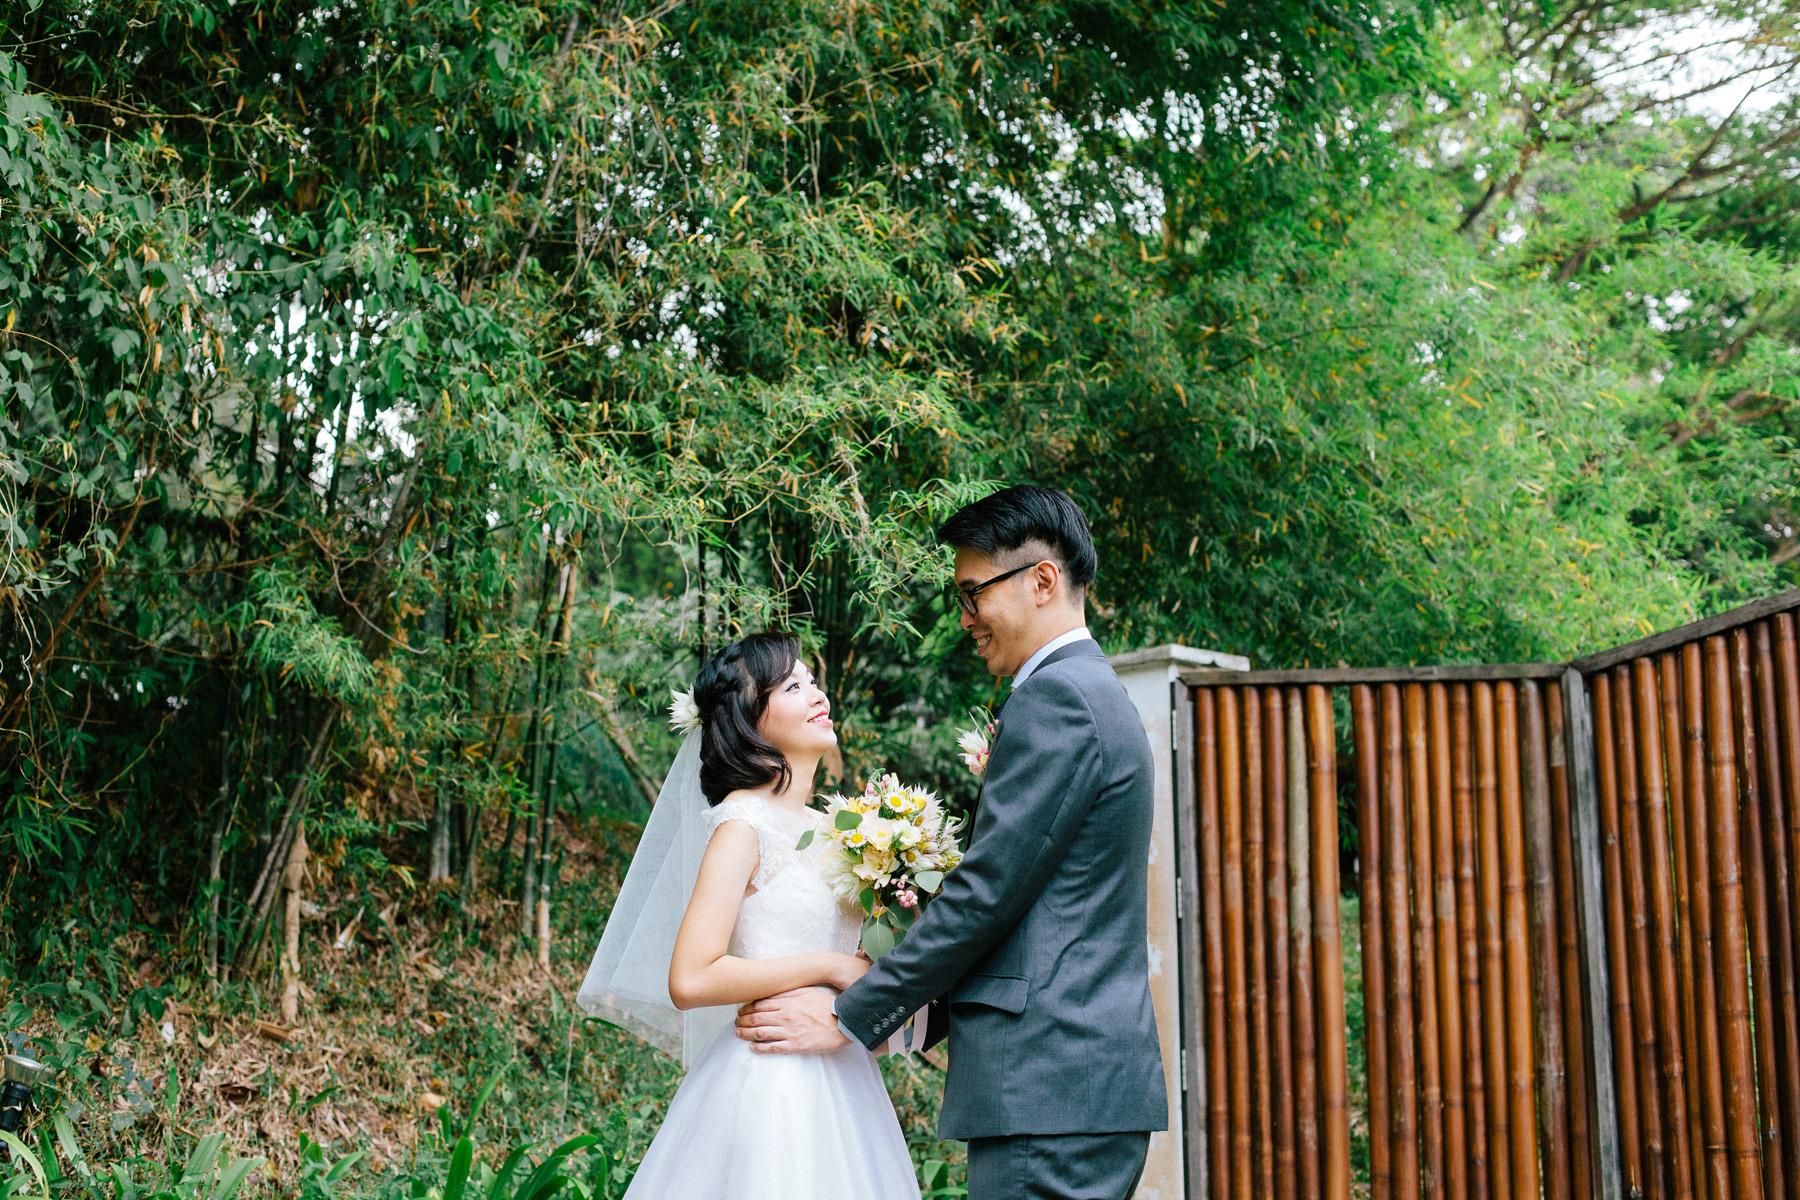 singapore-wedding-travel-photographer-faith-alvin-wedding-wmt-32.jpg